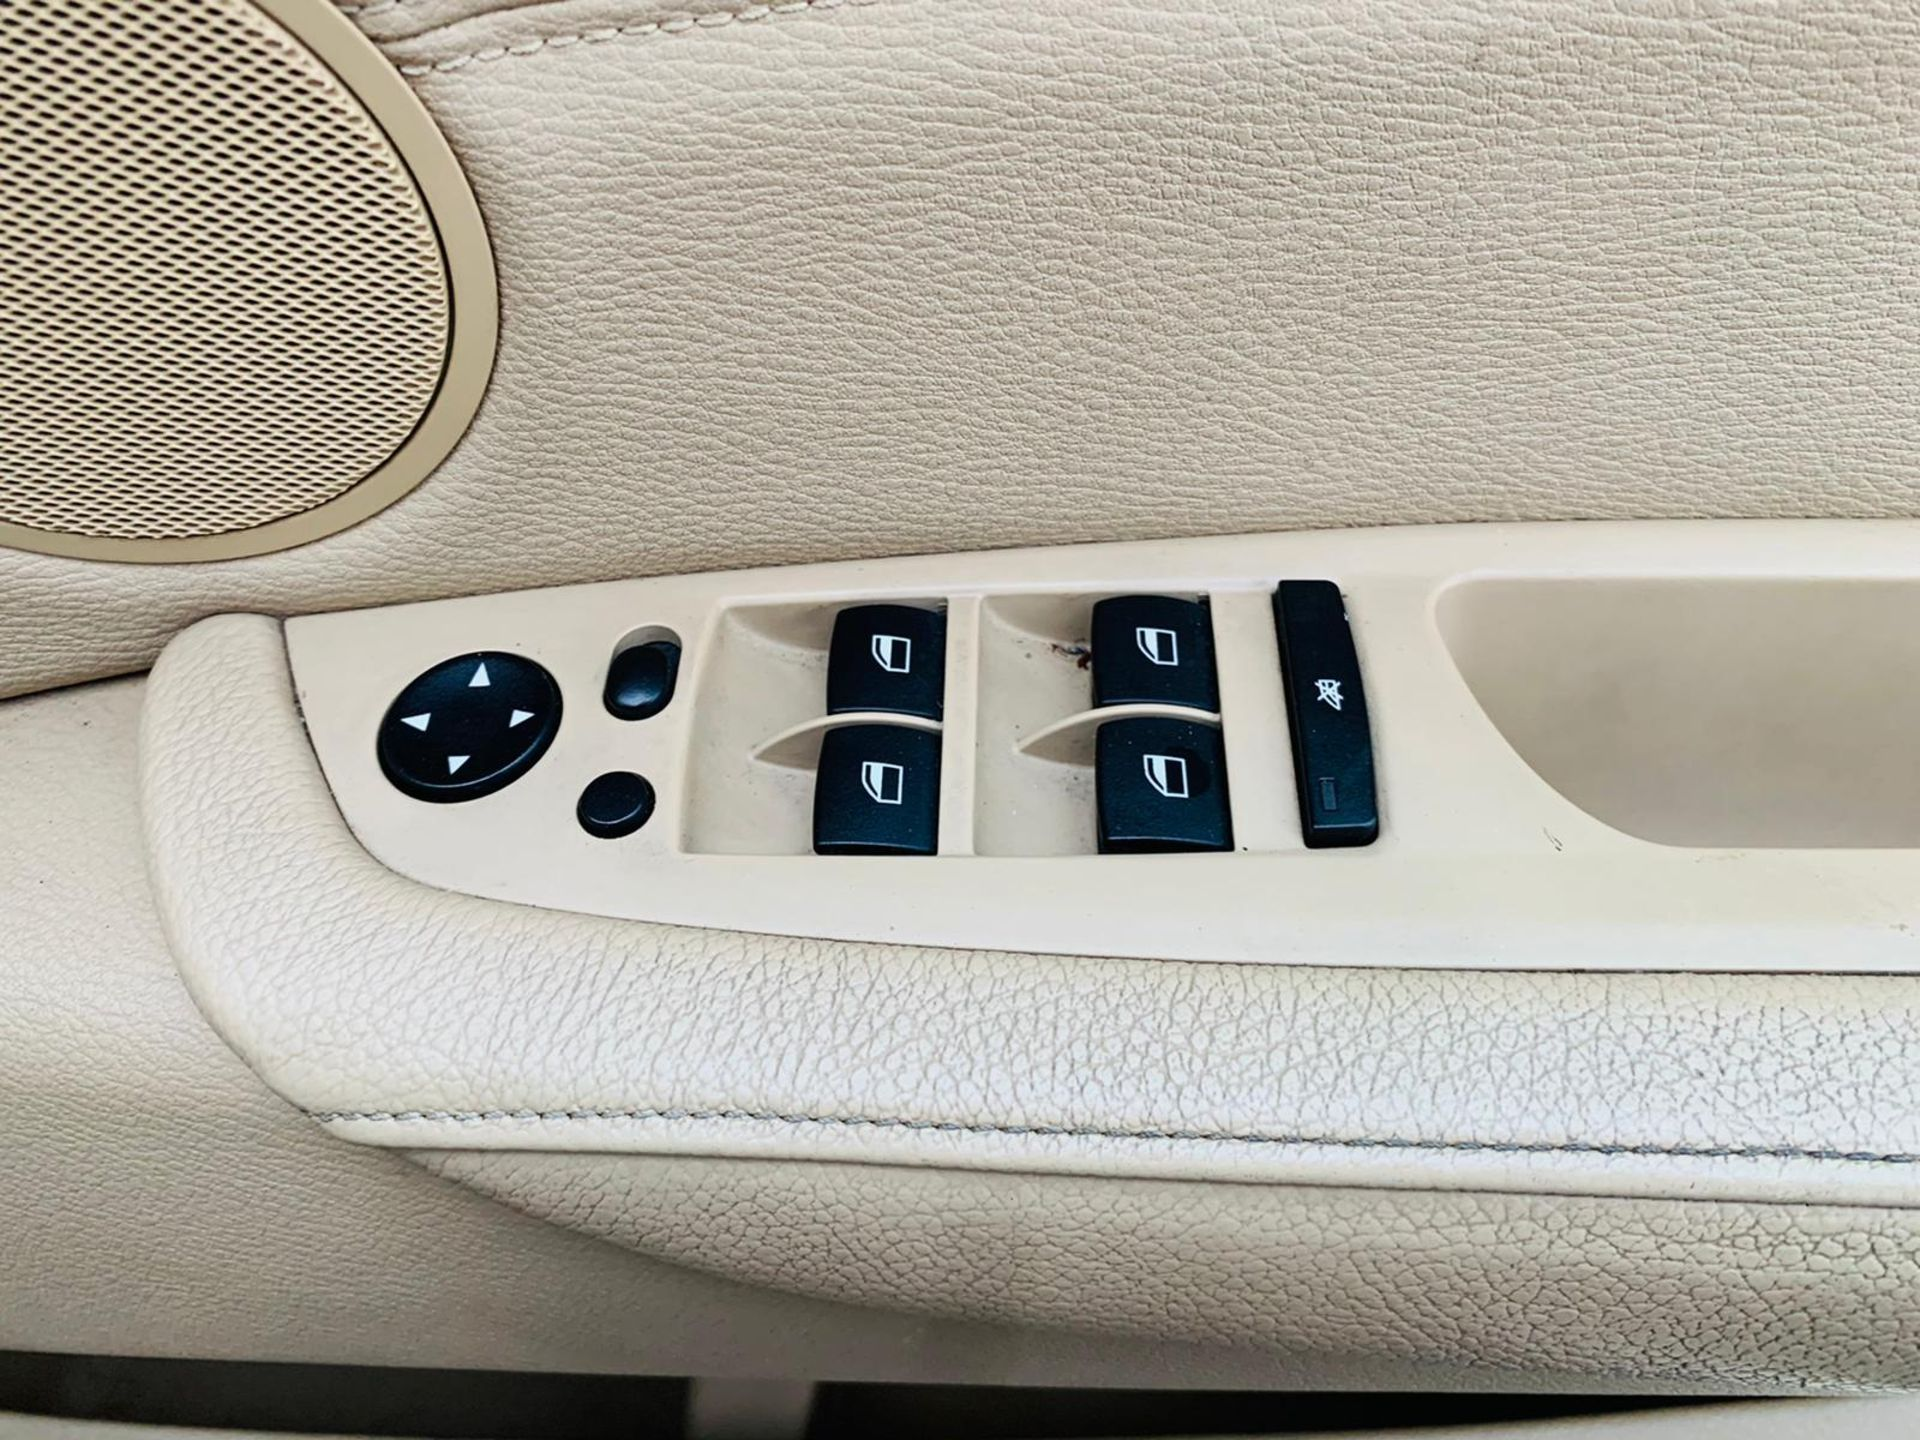 Reseve Met - BMW X6 xDrive 3.0d Auto - 2014 Reg - Leather Interior -Parking Sensors - Reversing Cam - Image 27 of 30